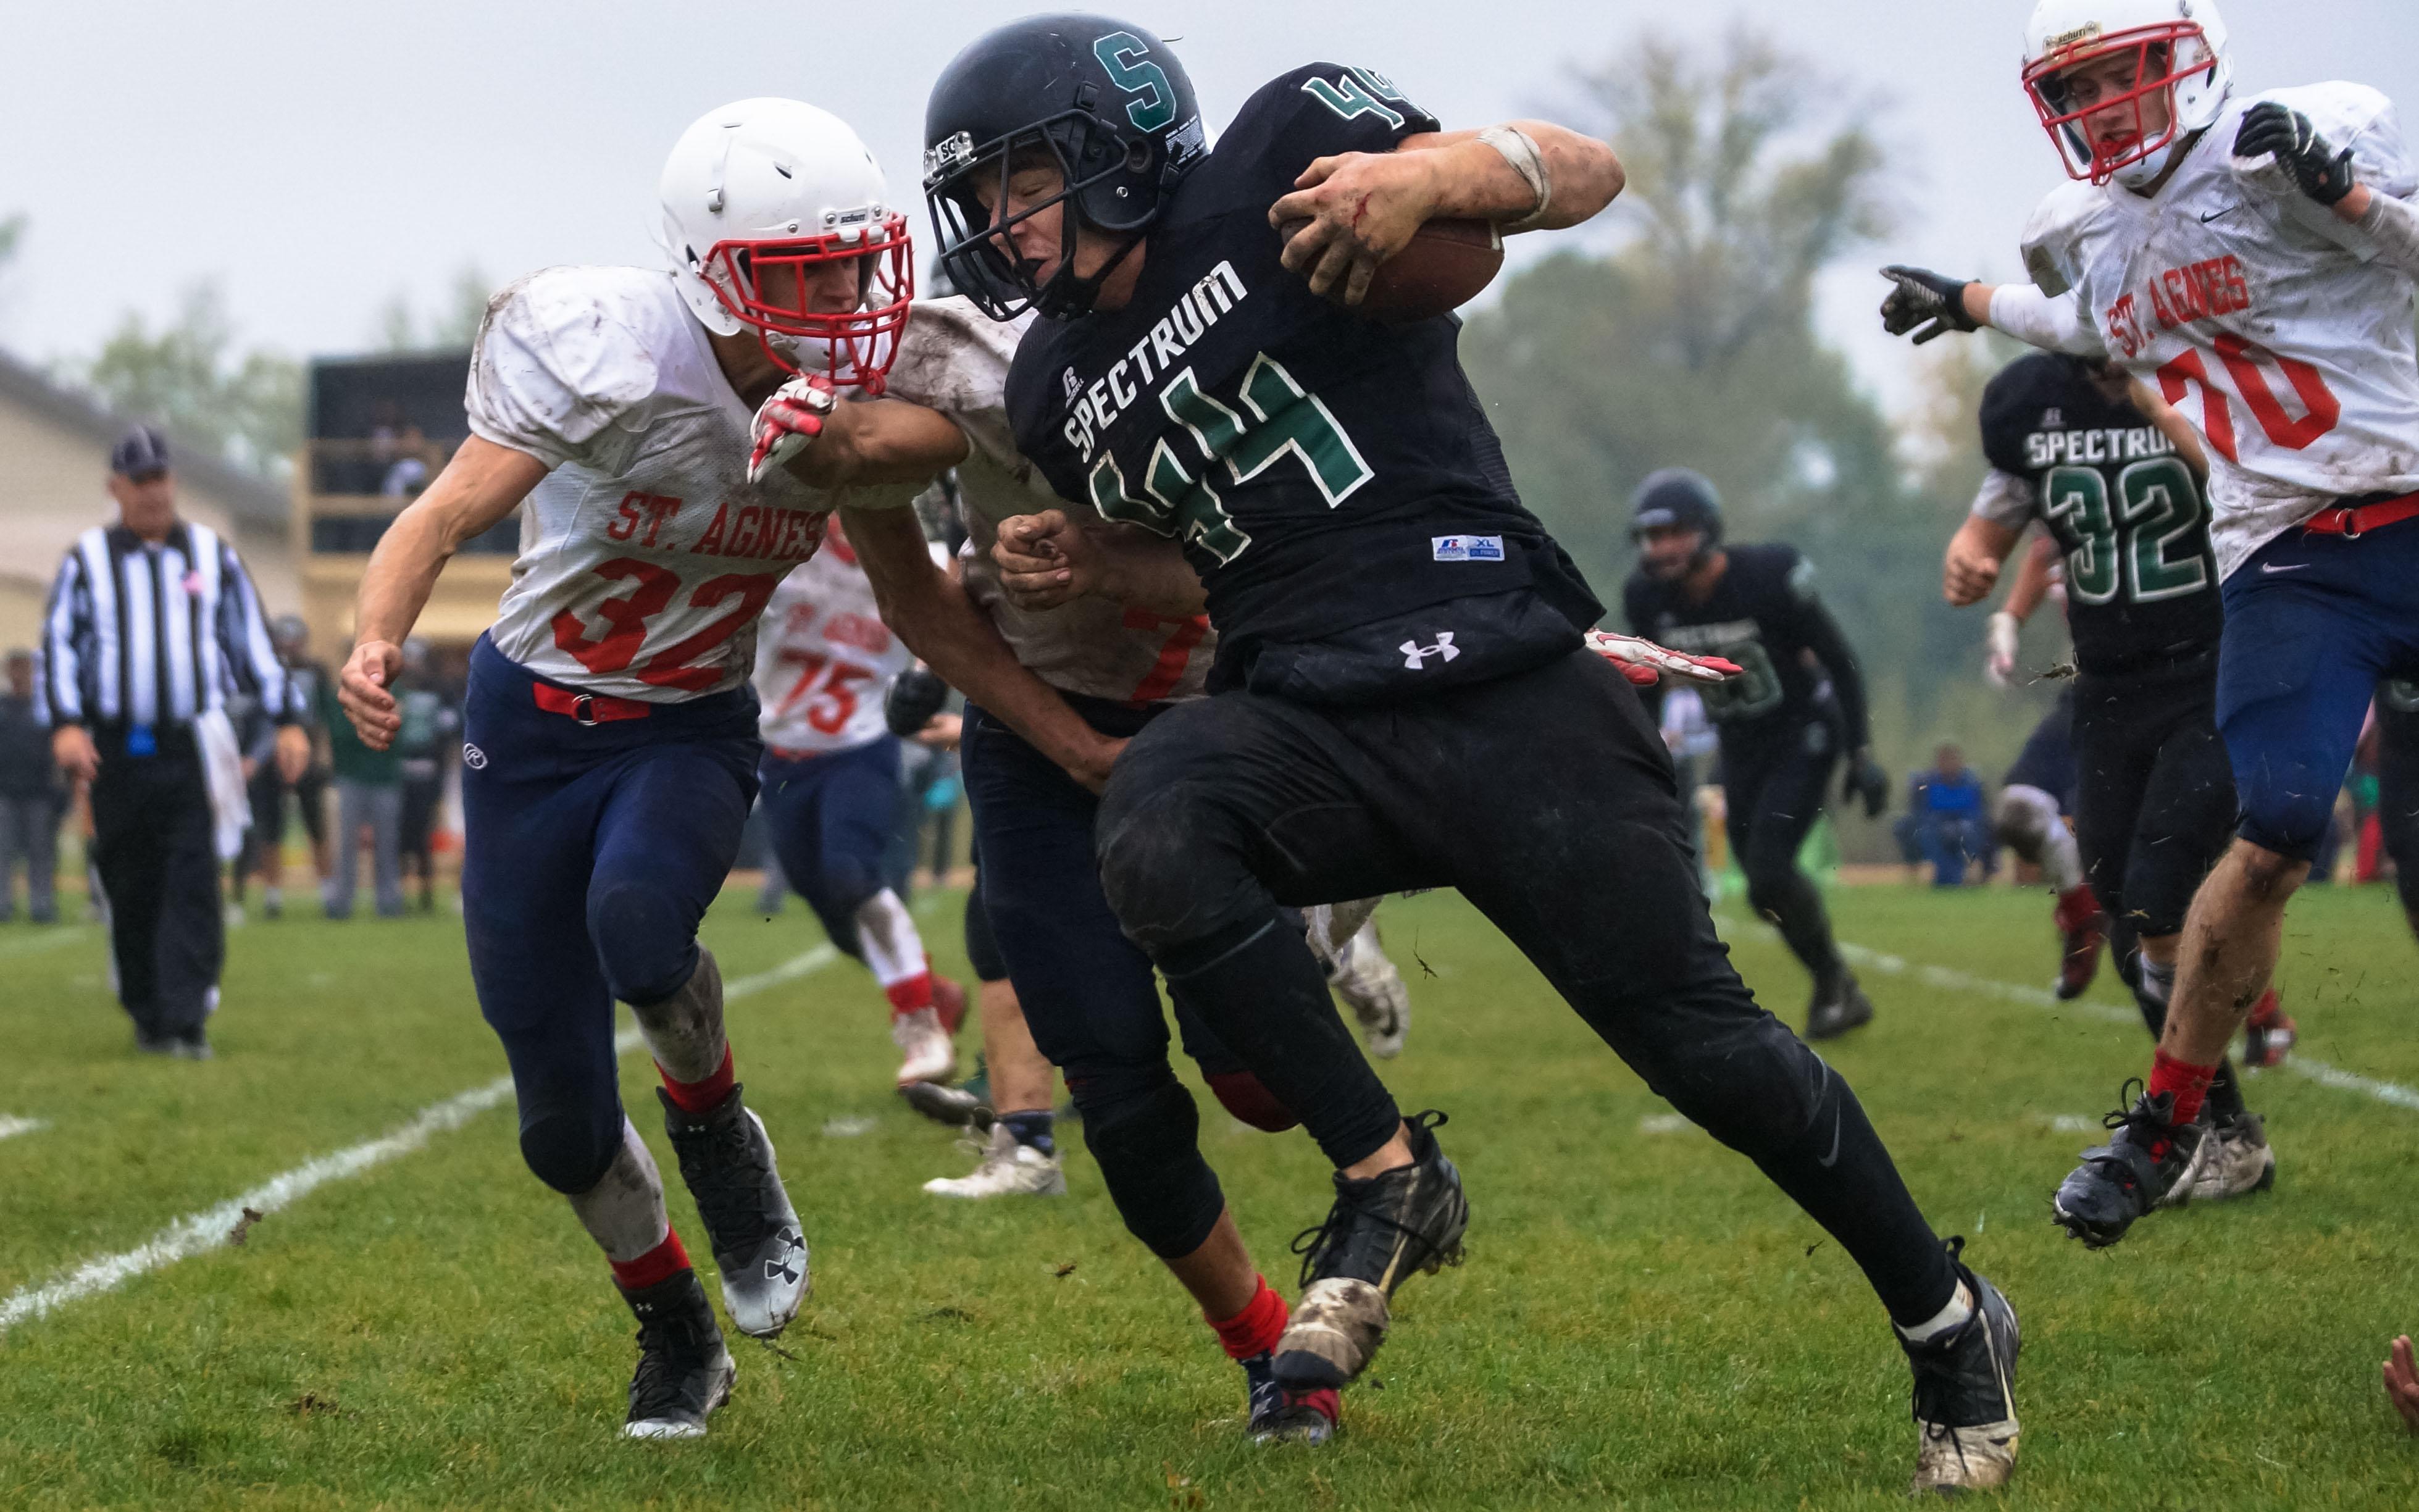 Sting runner Sam Cooper shields the football from St. Agnes attackers Friday in Elk River. Photo by Korey McDermott, SportsEngine